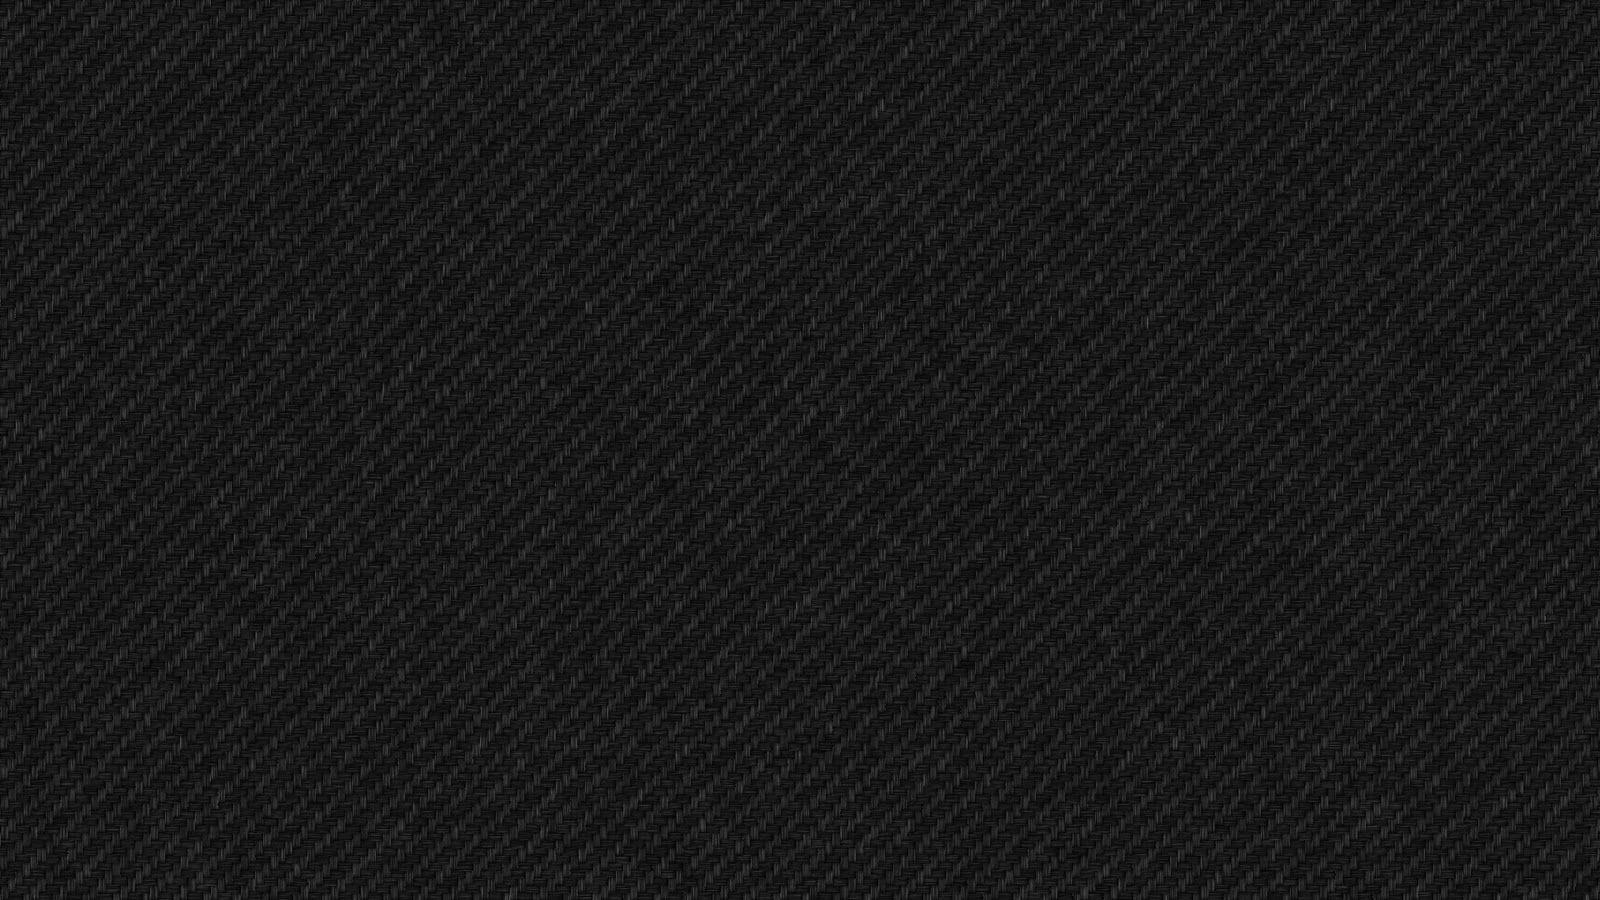 Plain Black Wallpapers Hd 1600 900 Black Hd Wallpaper 47 Wallpapers Adorable Wallpapers Dark Black Wallpaper Black Wallpaper Black And White Wallpaper